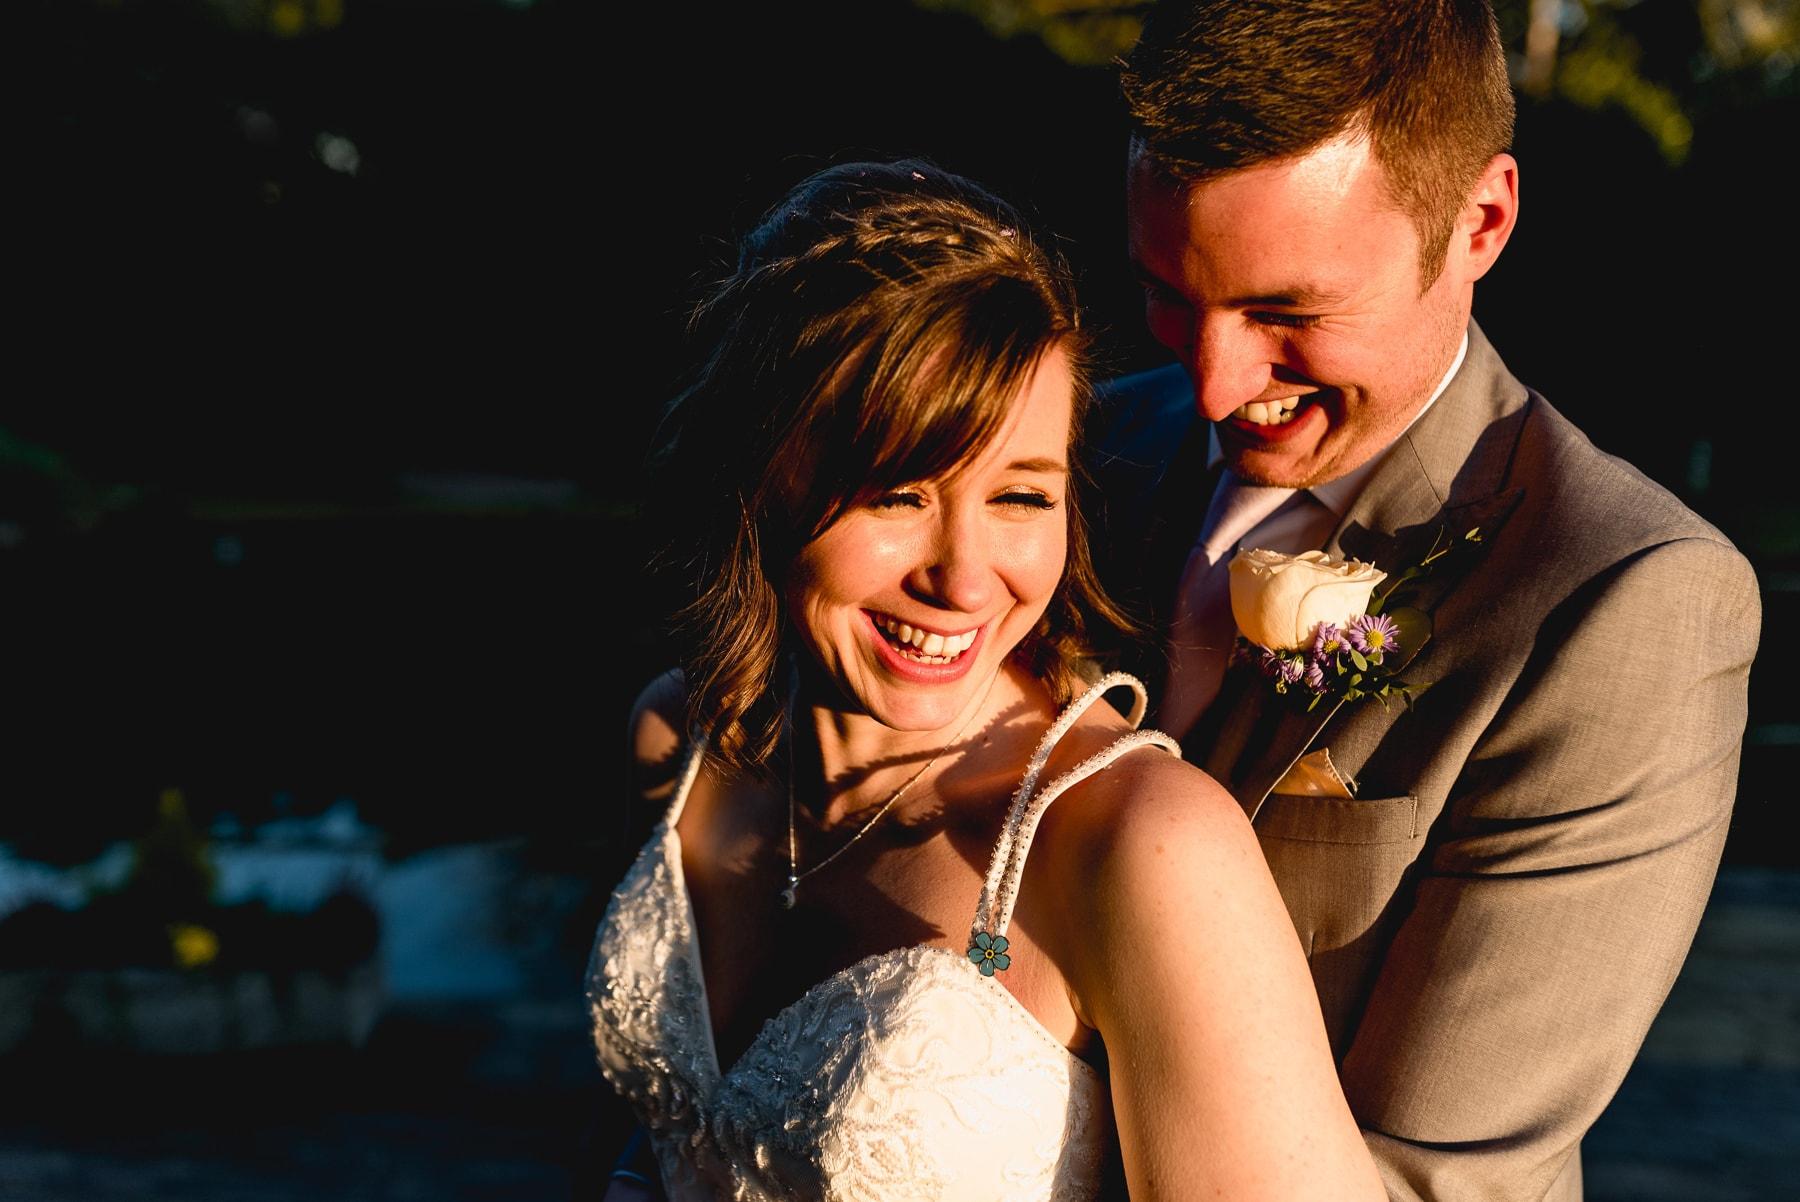 Redhouse Barn Wintery Wedding with Emilia and Luke